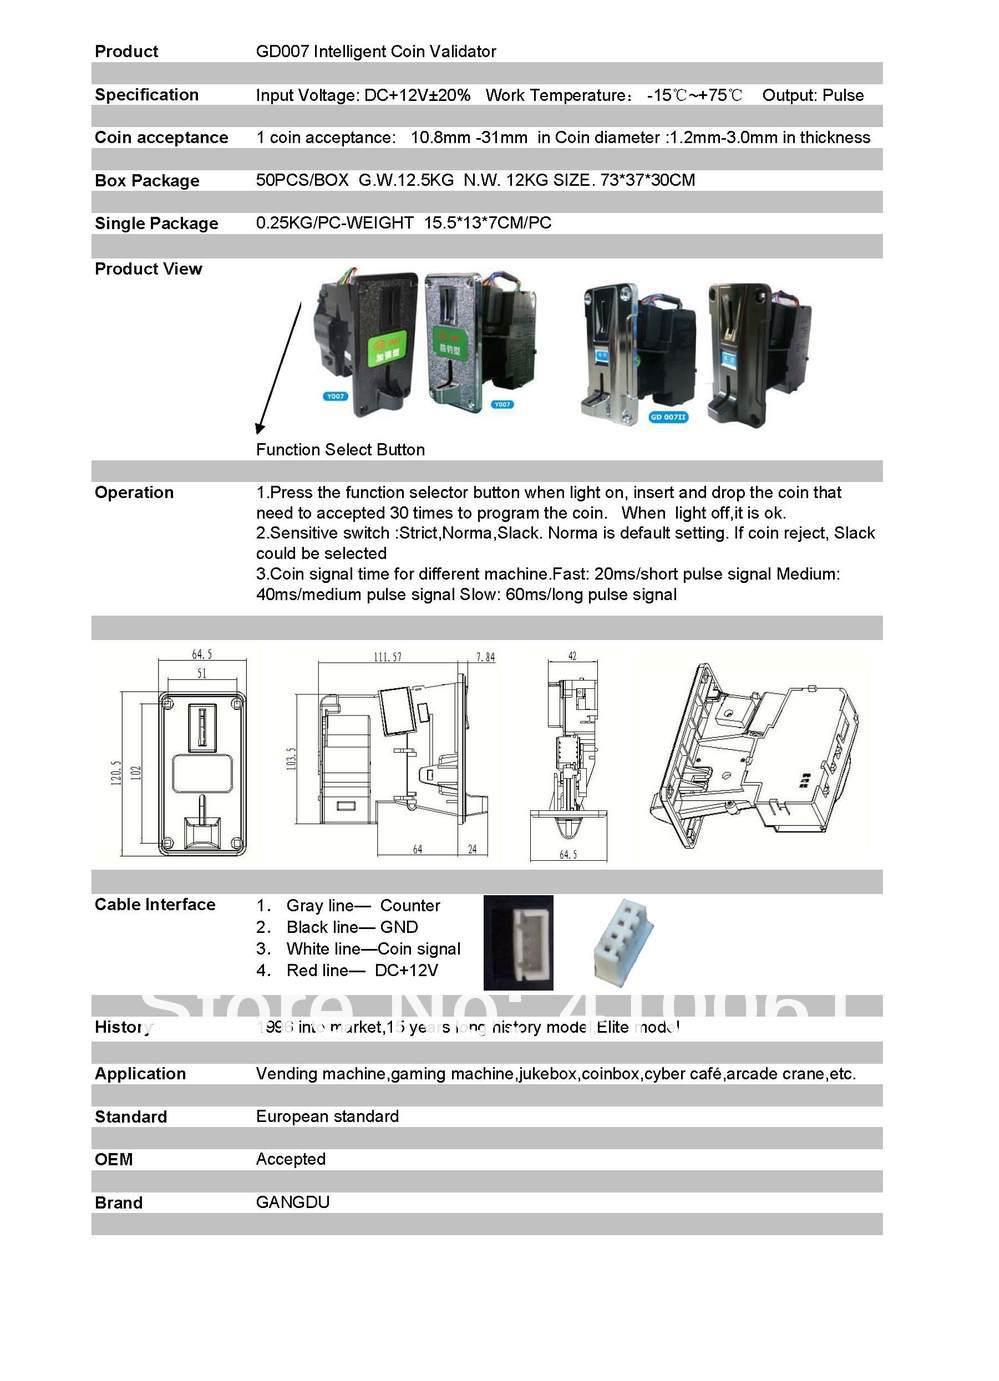 007 tech manual.jpg